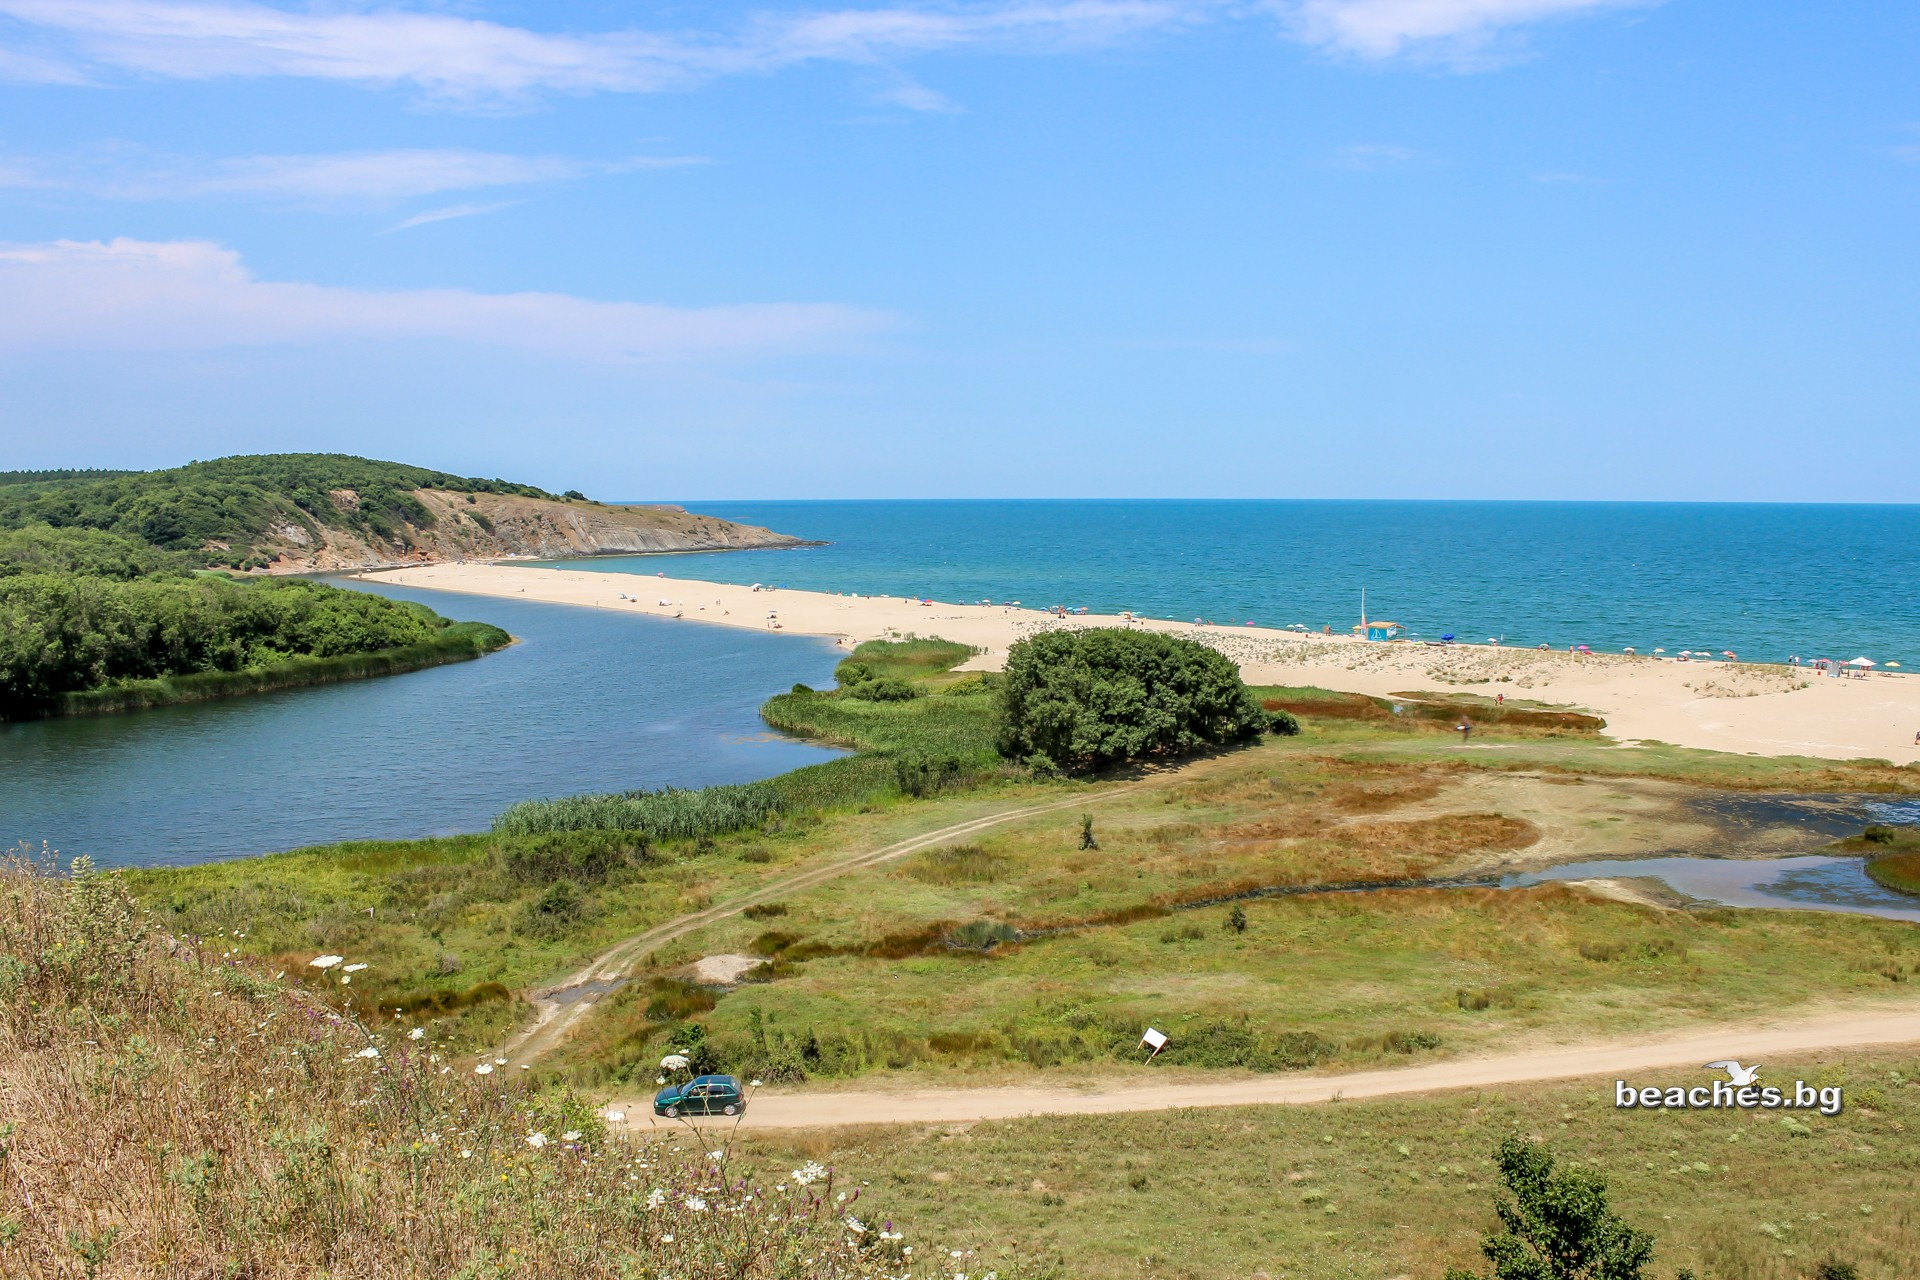 beaches.bg - Плаж река Велека, Синеморец, България/ River Veleka Beach, Sinemorets, Bulgaria